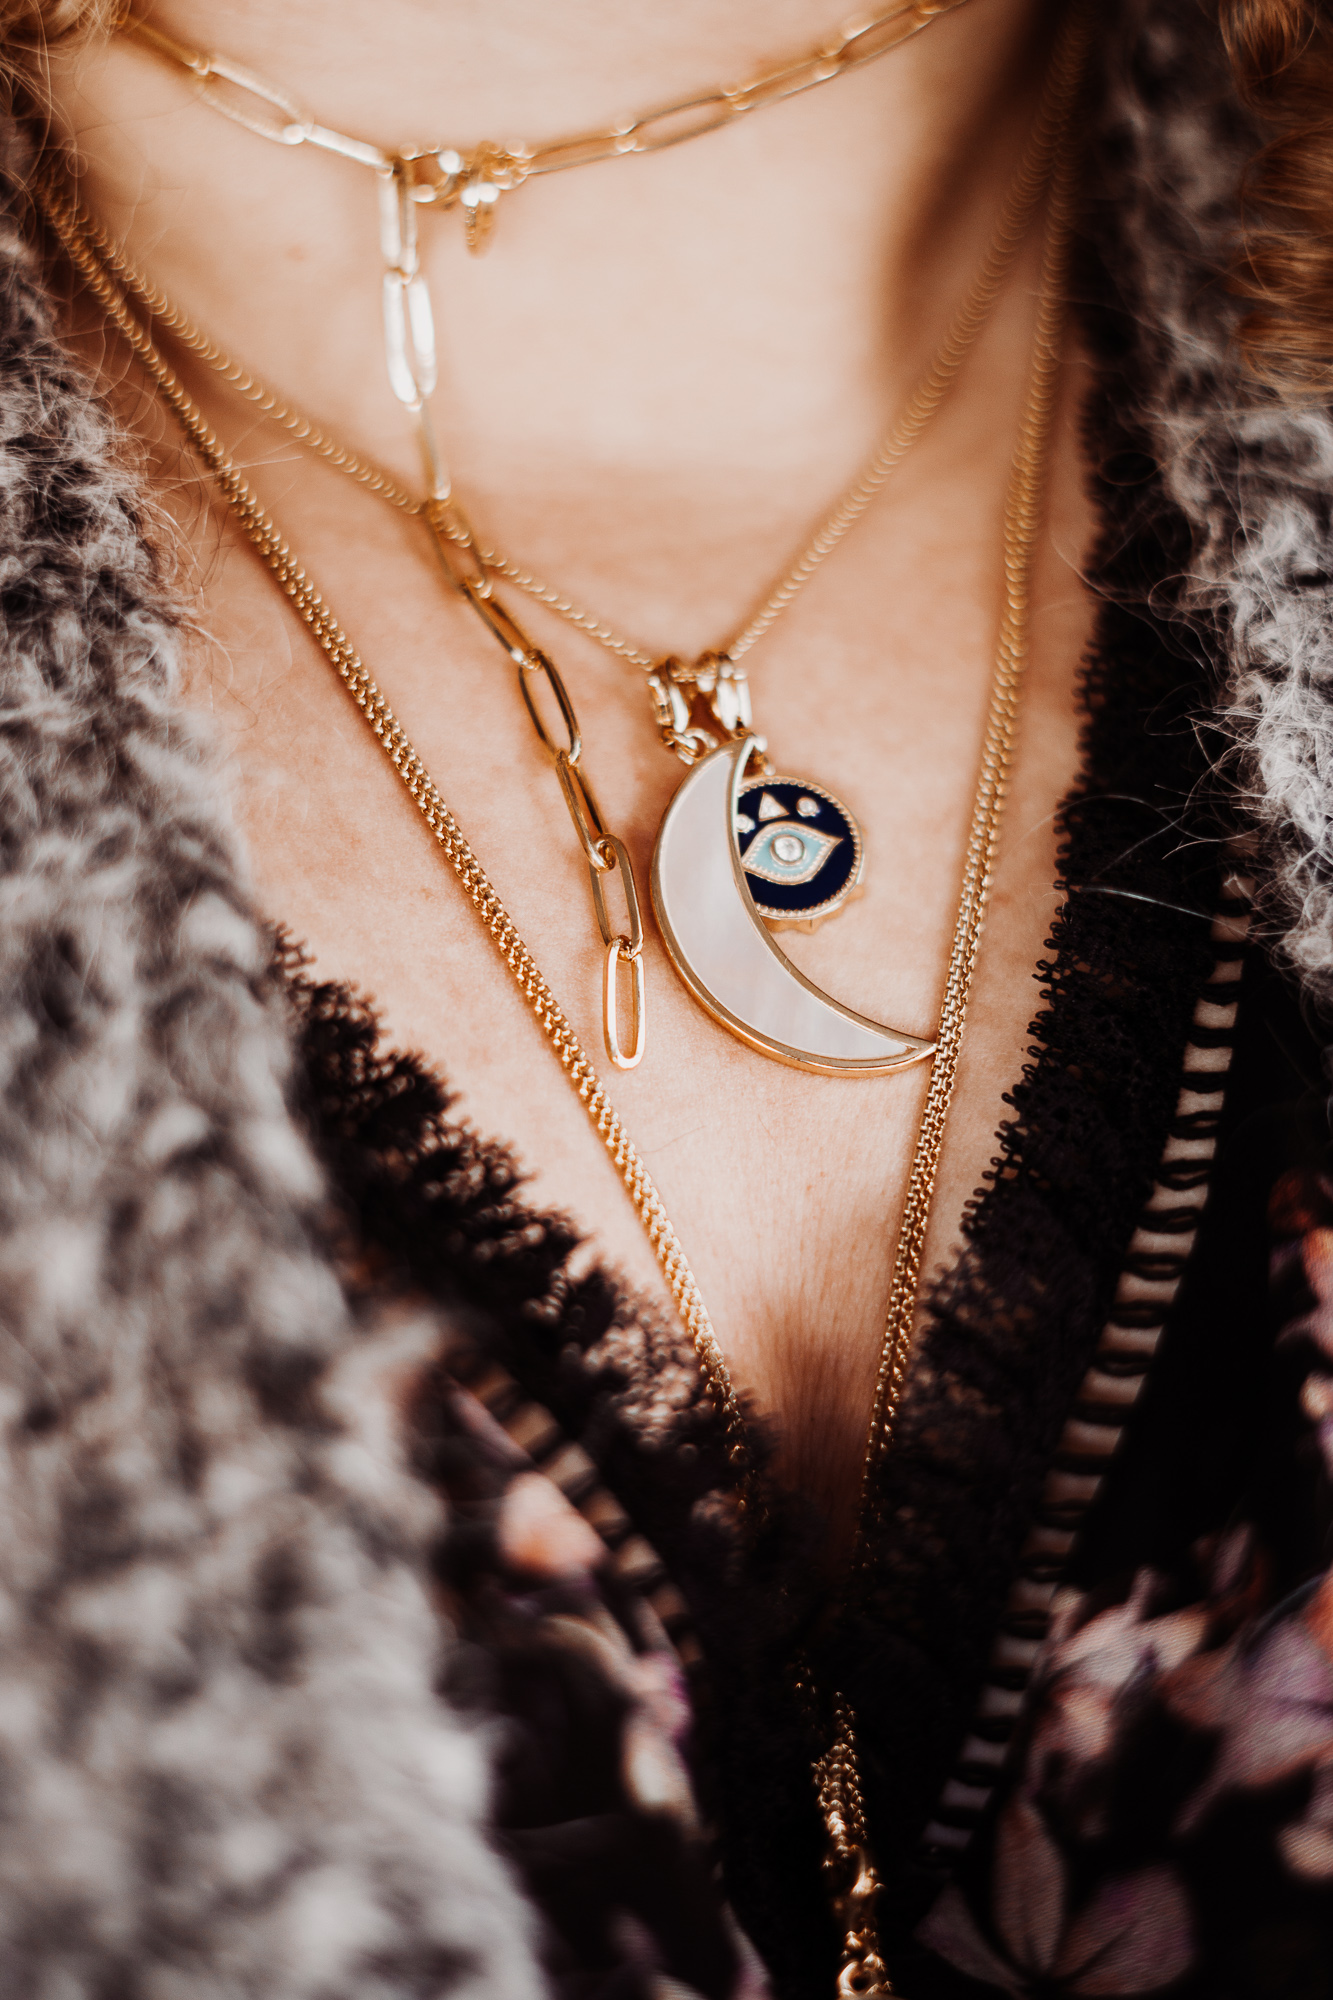 ketten-layering-trend-thomas-sabo-modeblog-infatstyle-fashionblog